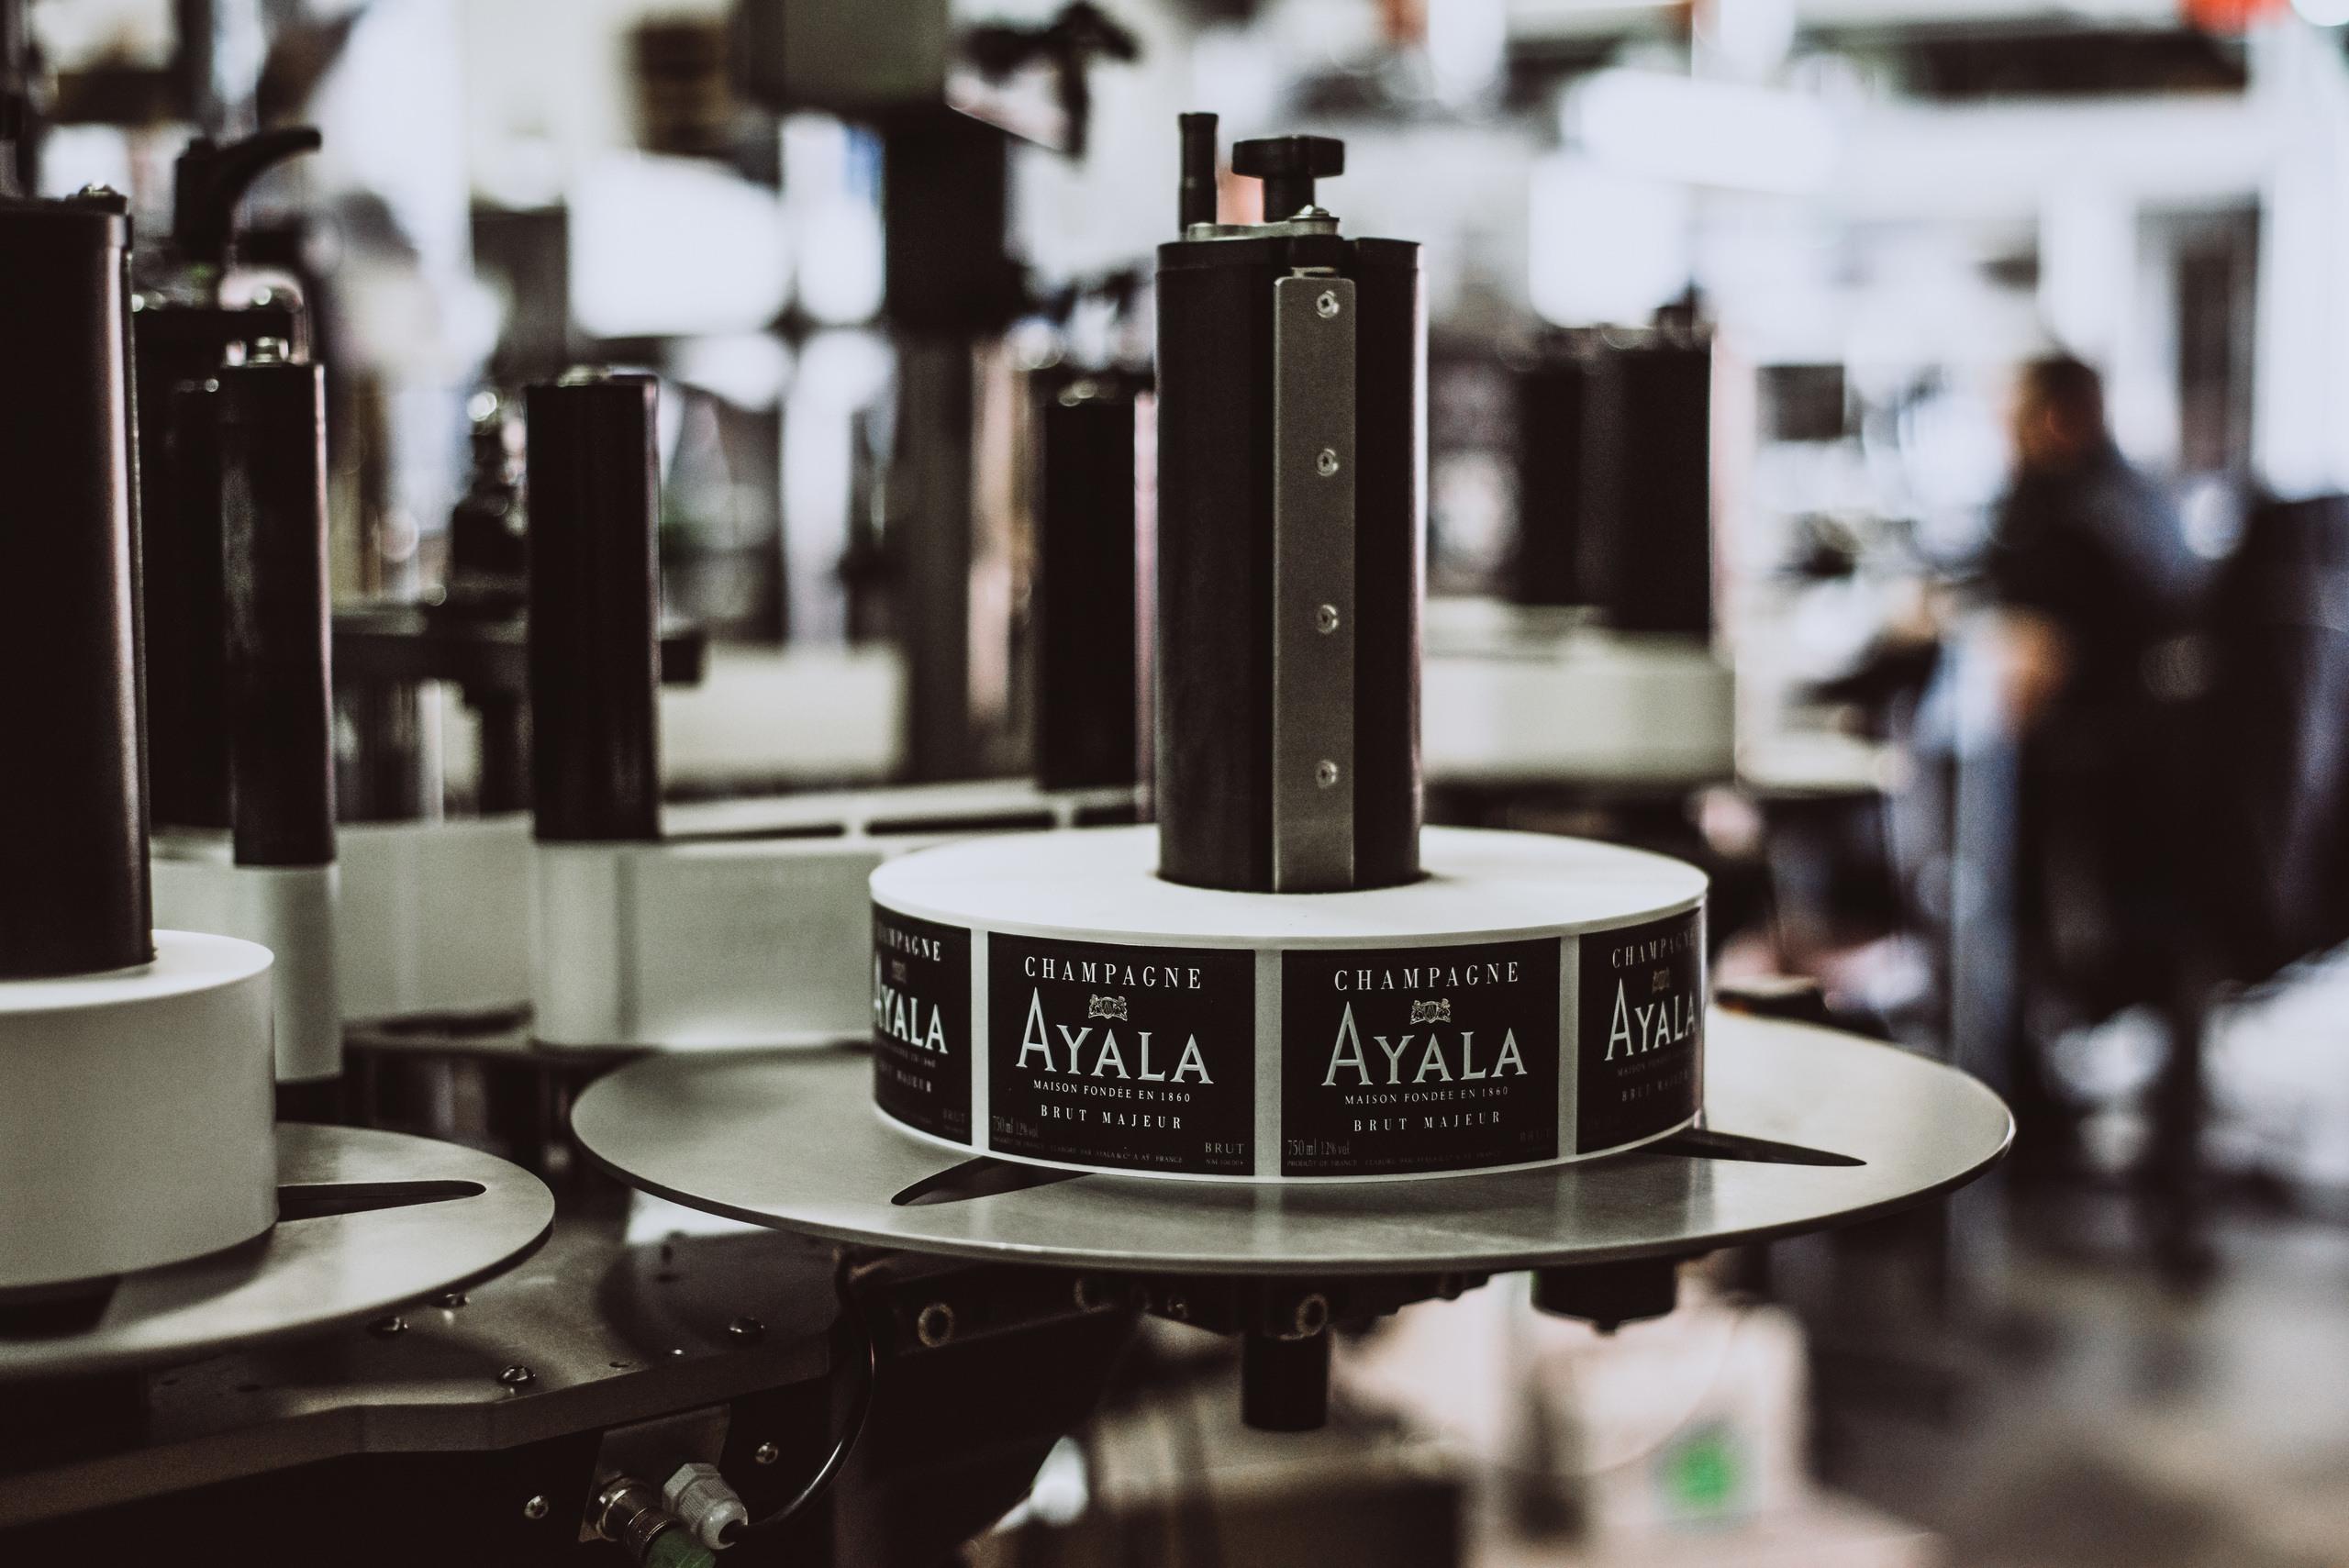 Impressum - Champagne Ayala